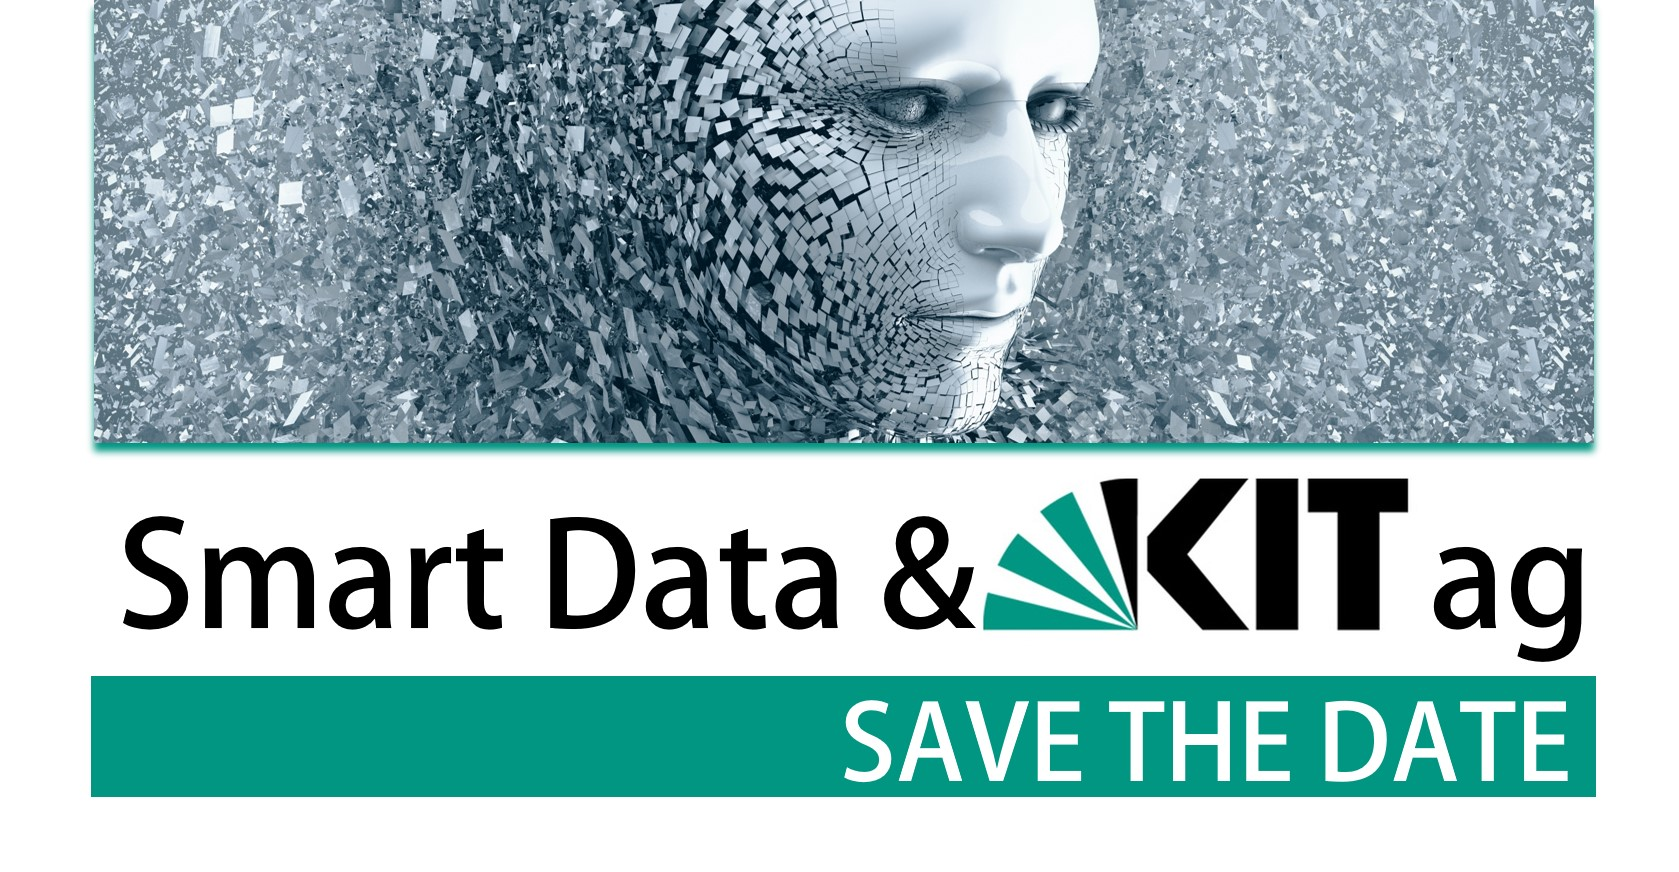 Smart Data & KI Tag 2020 – Save the Date